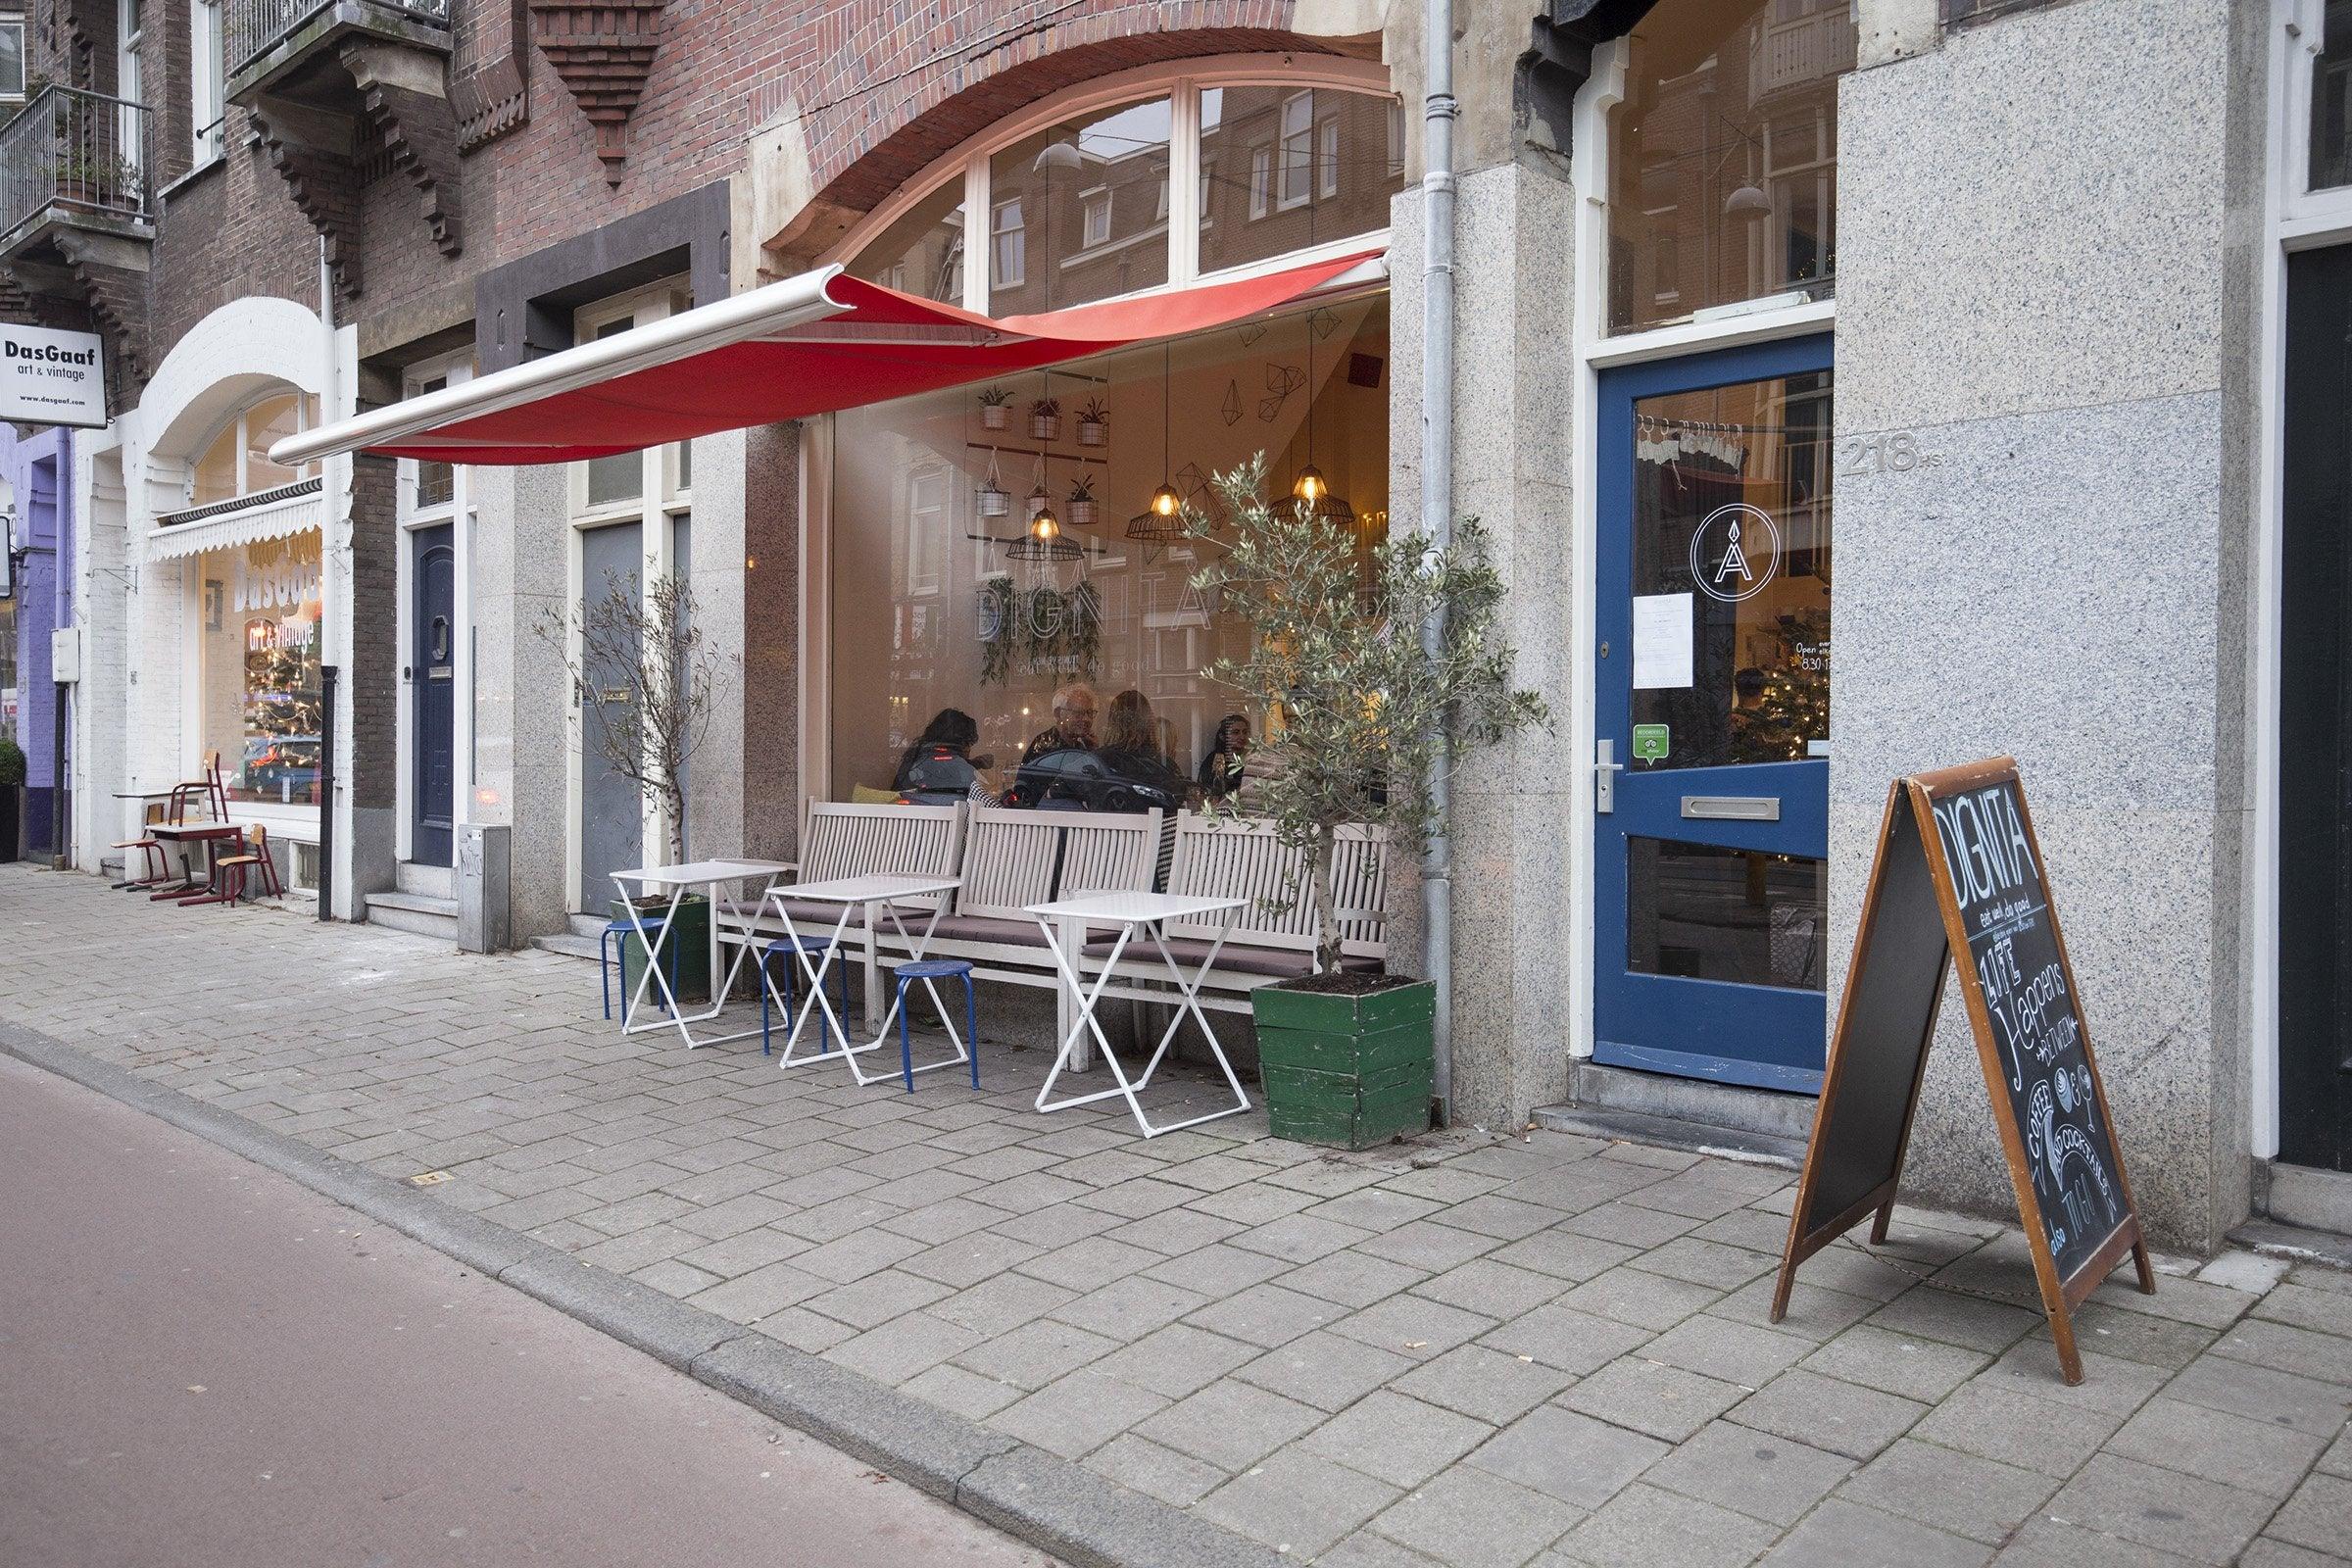 Lomanstraat